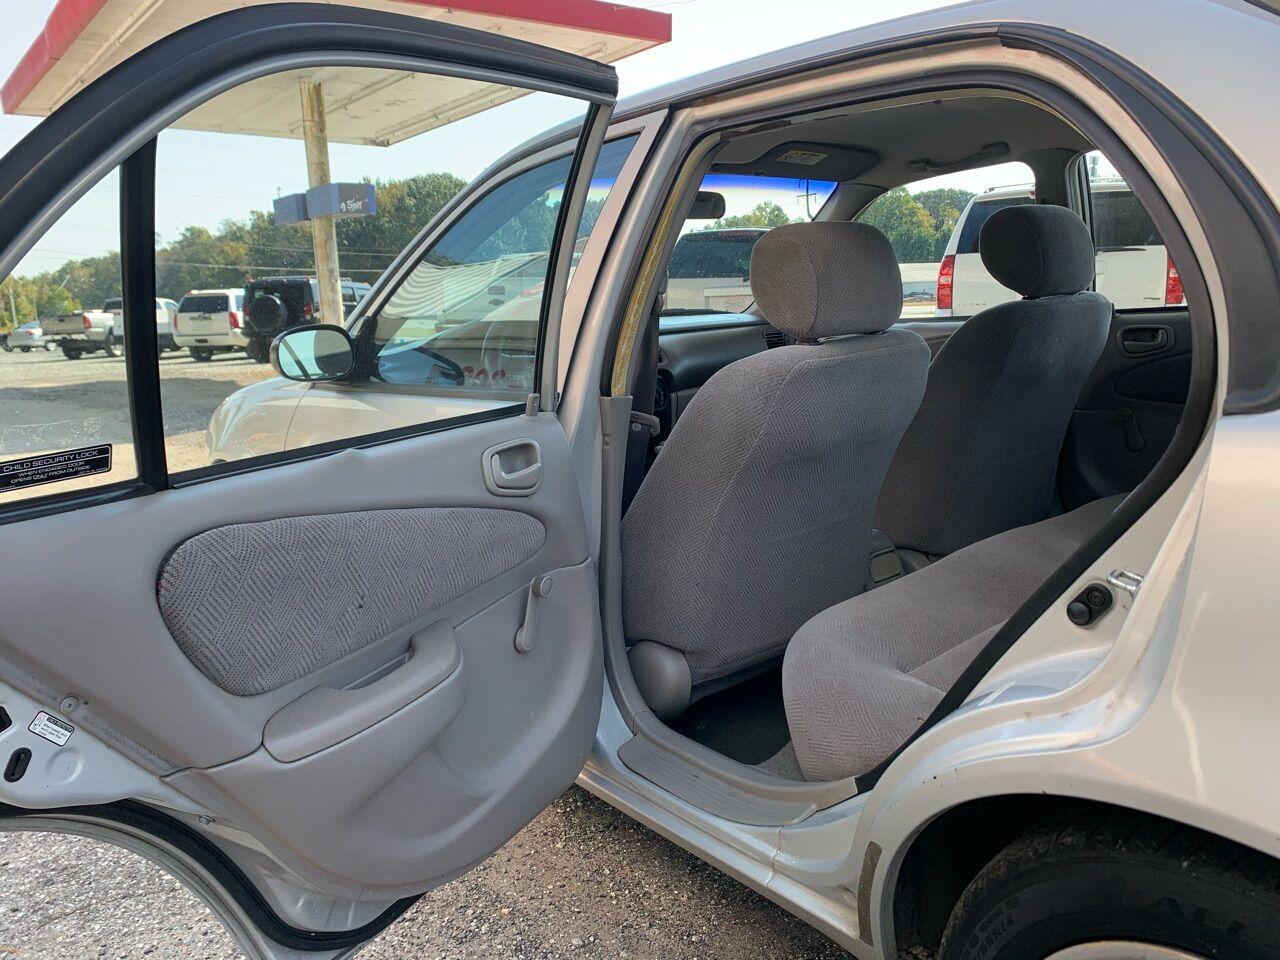 ChevroletPrizm11